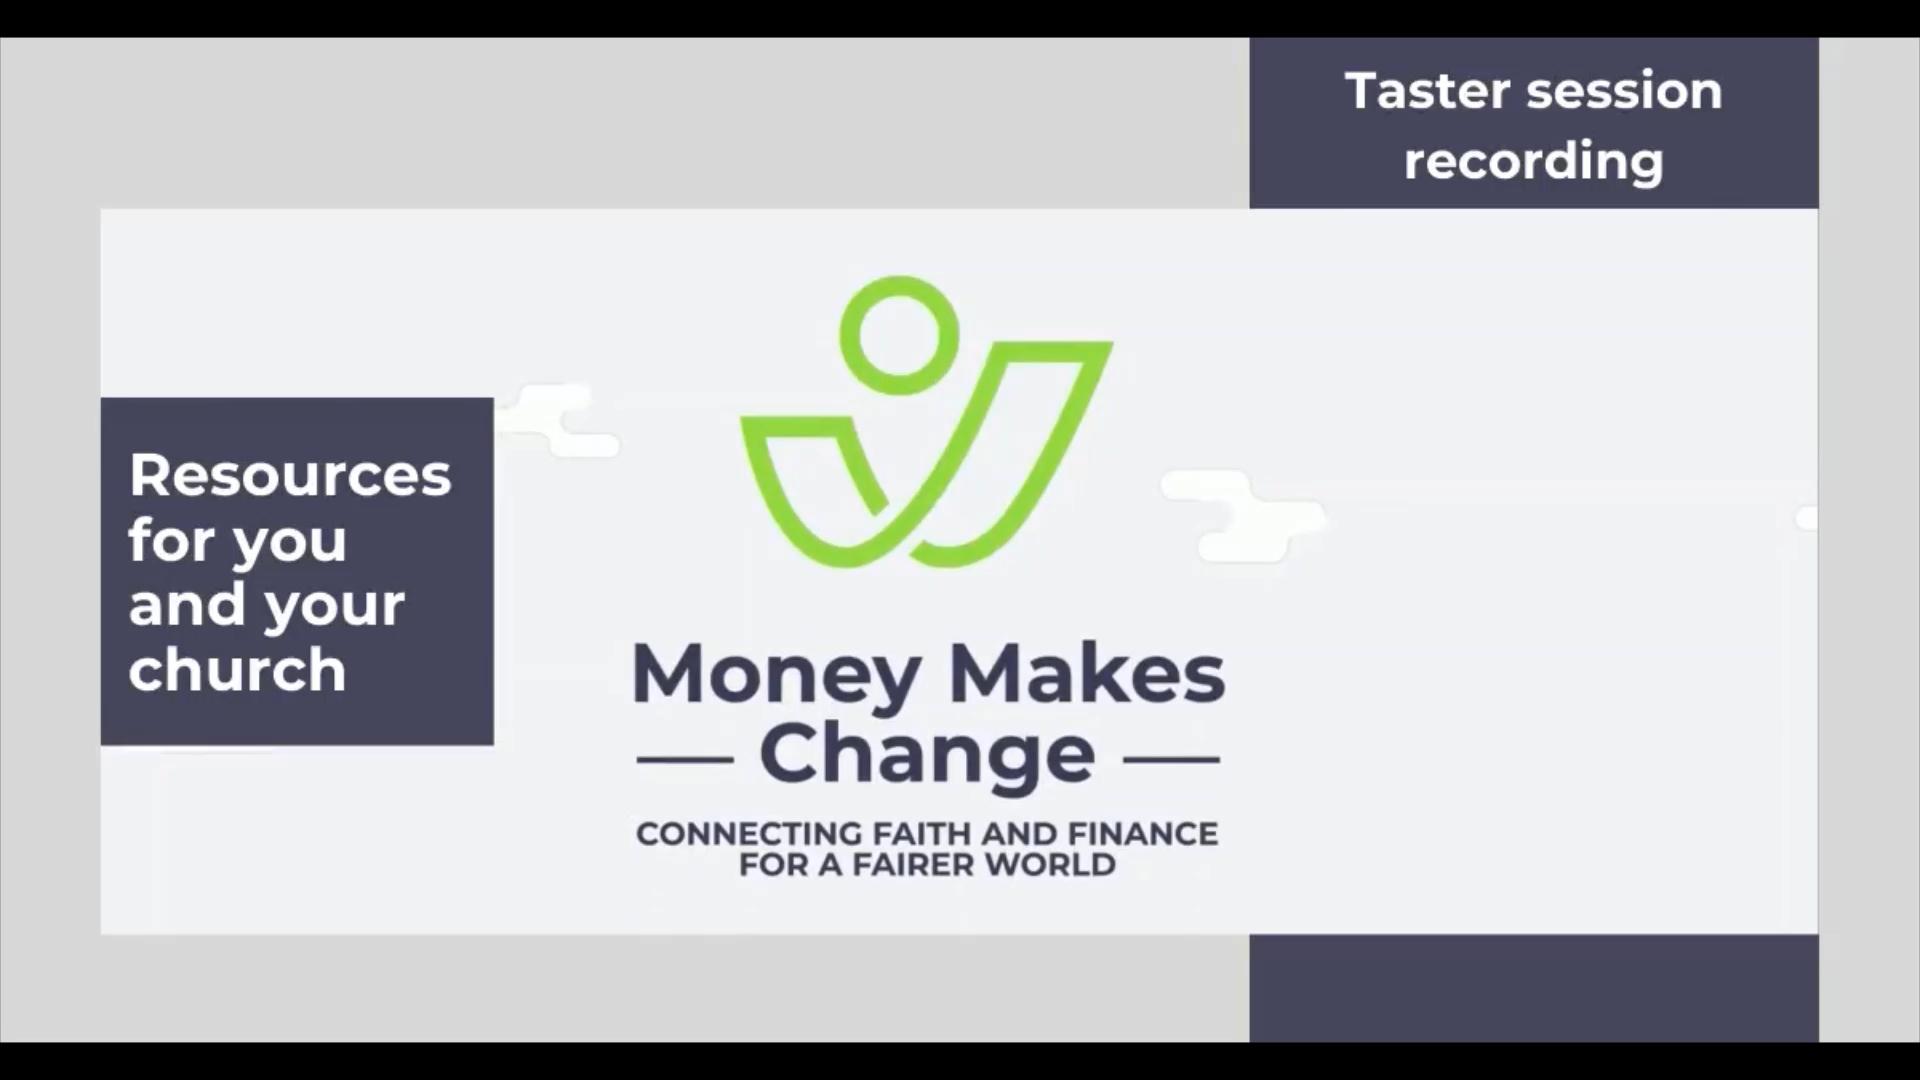 Money Makes Change Online Taster Session | 20 August 2020